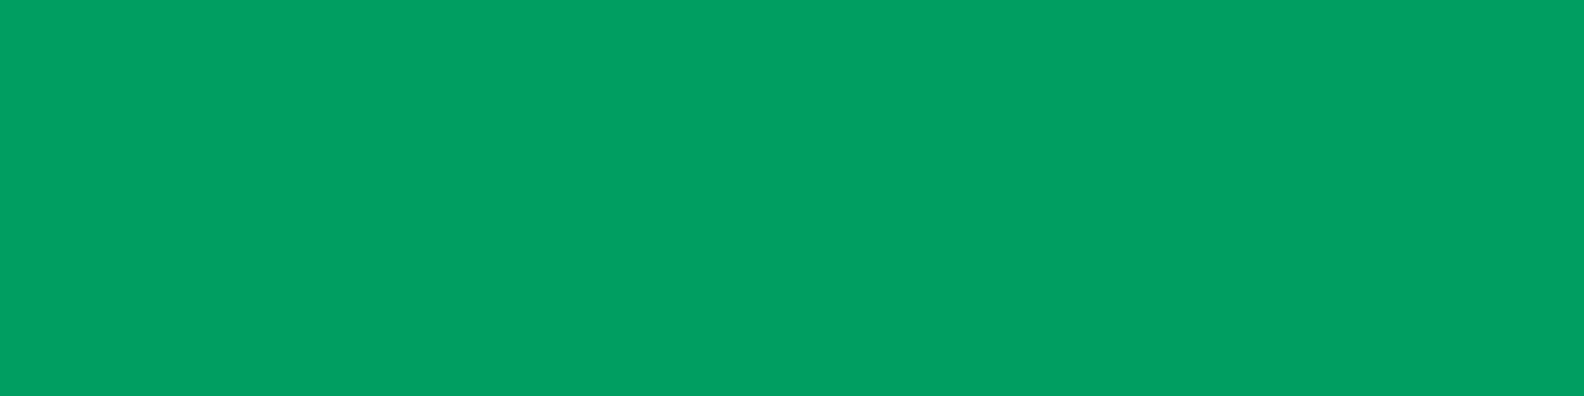 1584x396 Shamrock Green Solid Color Background